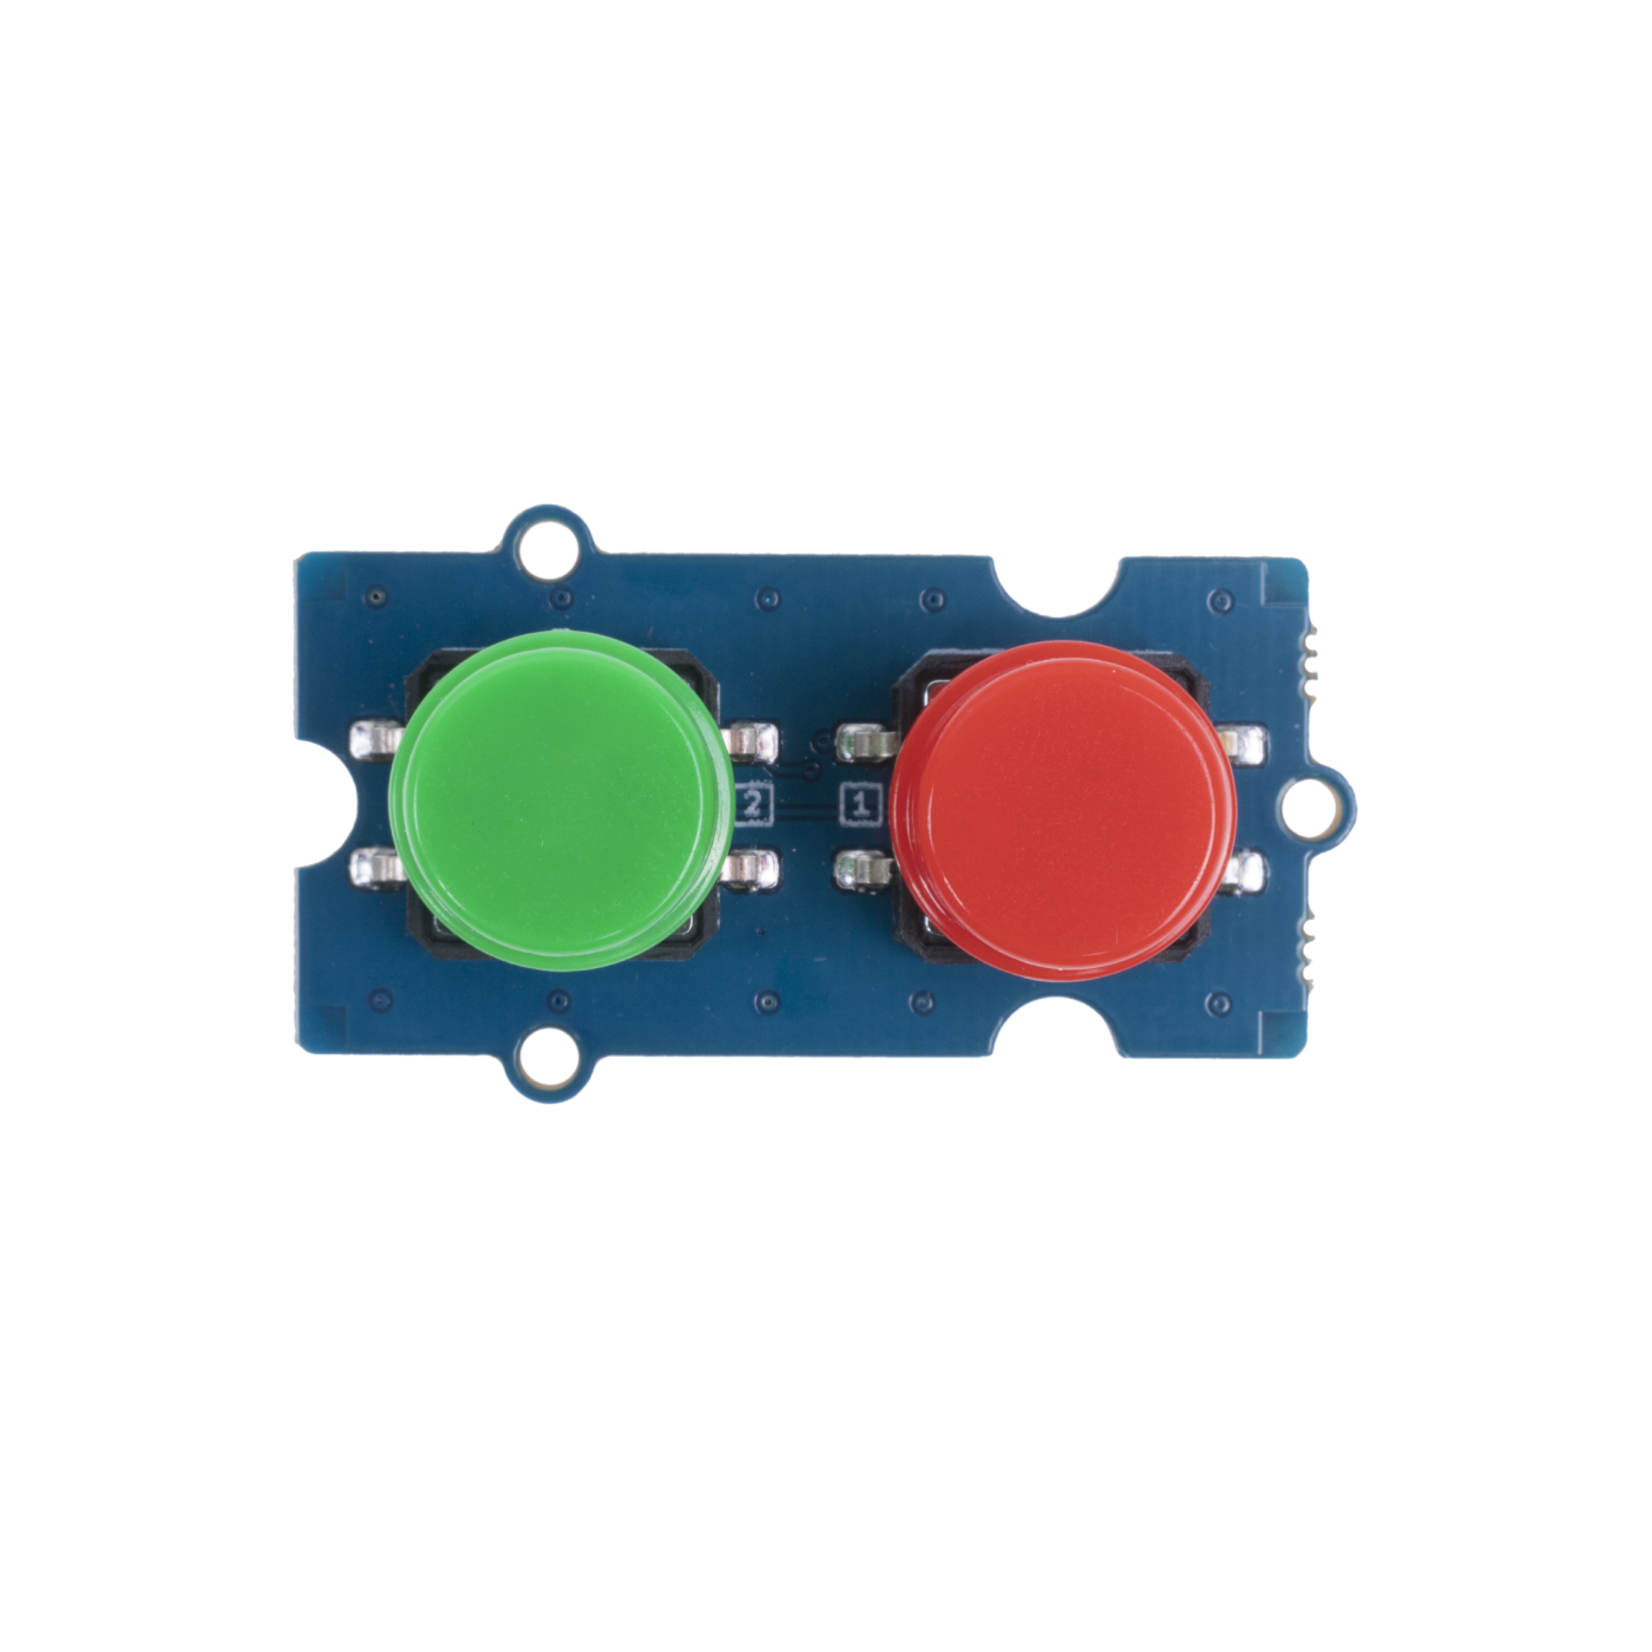 Seeed Grove - Dual Button